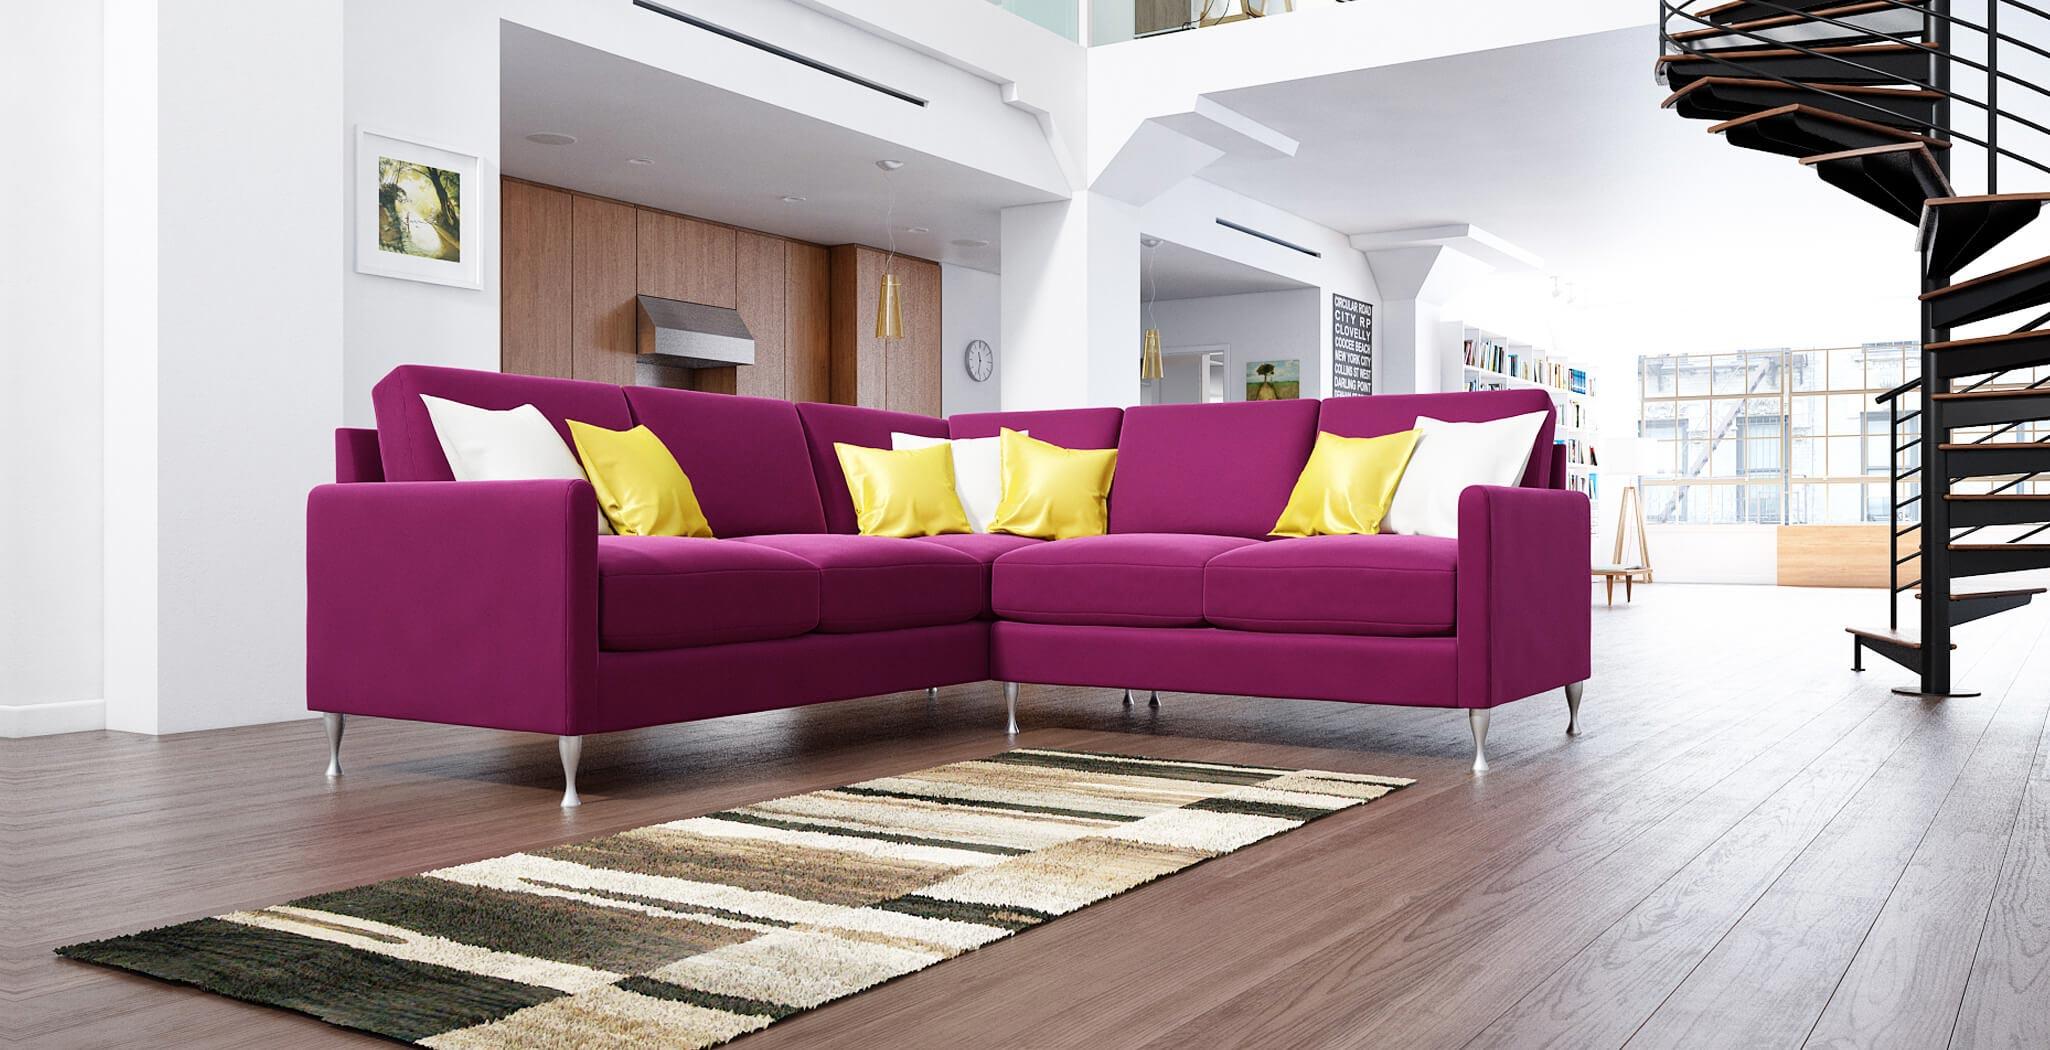 eureka sectional furniture gallery 3